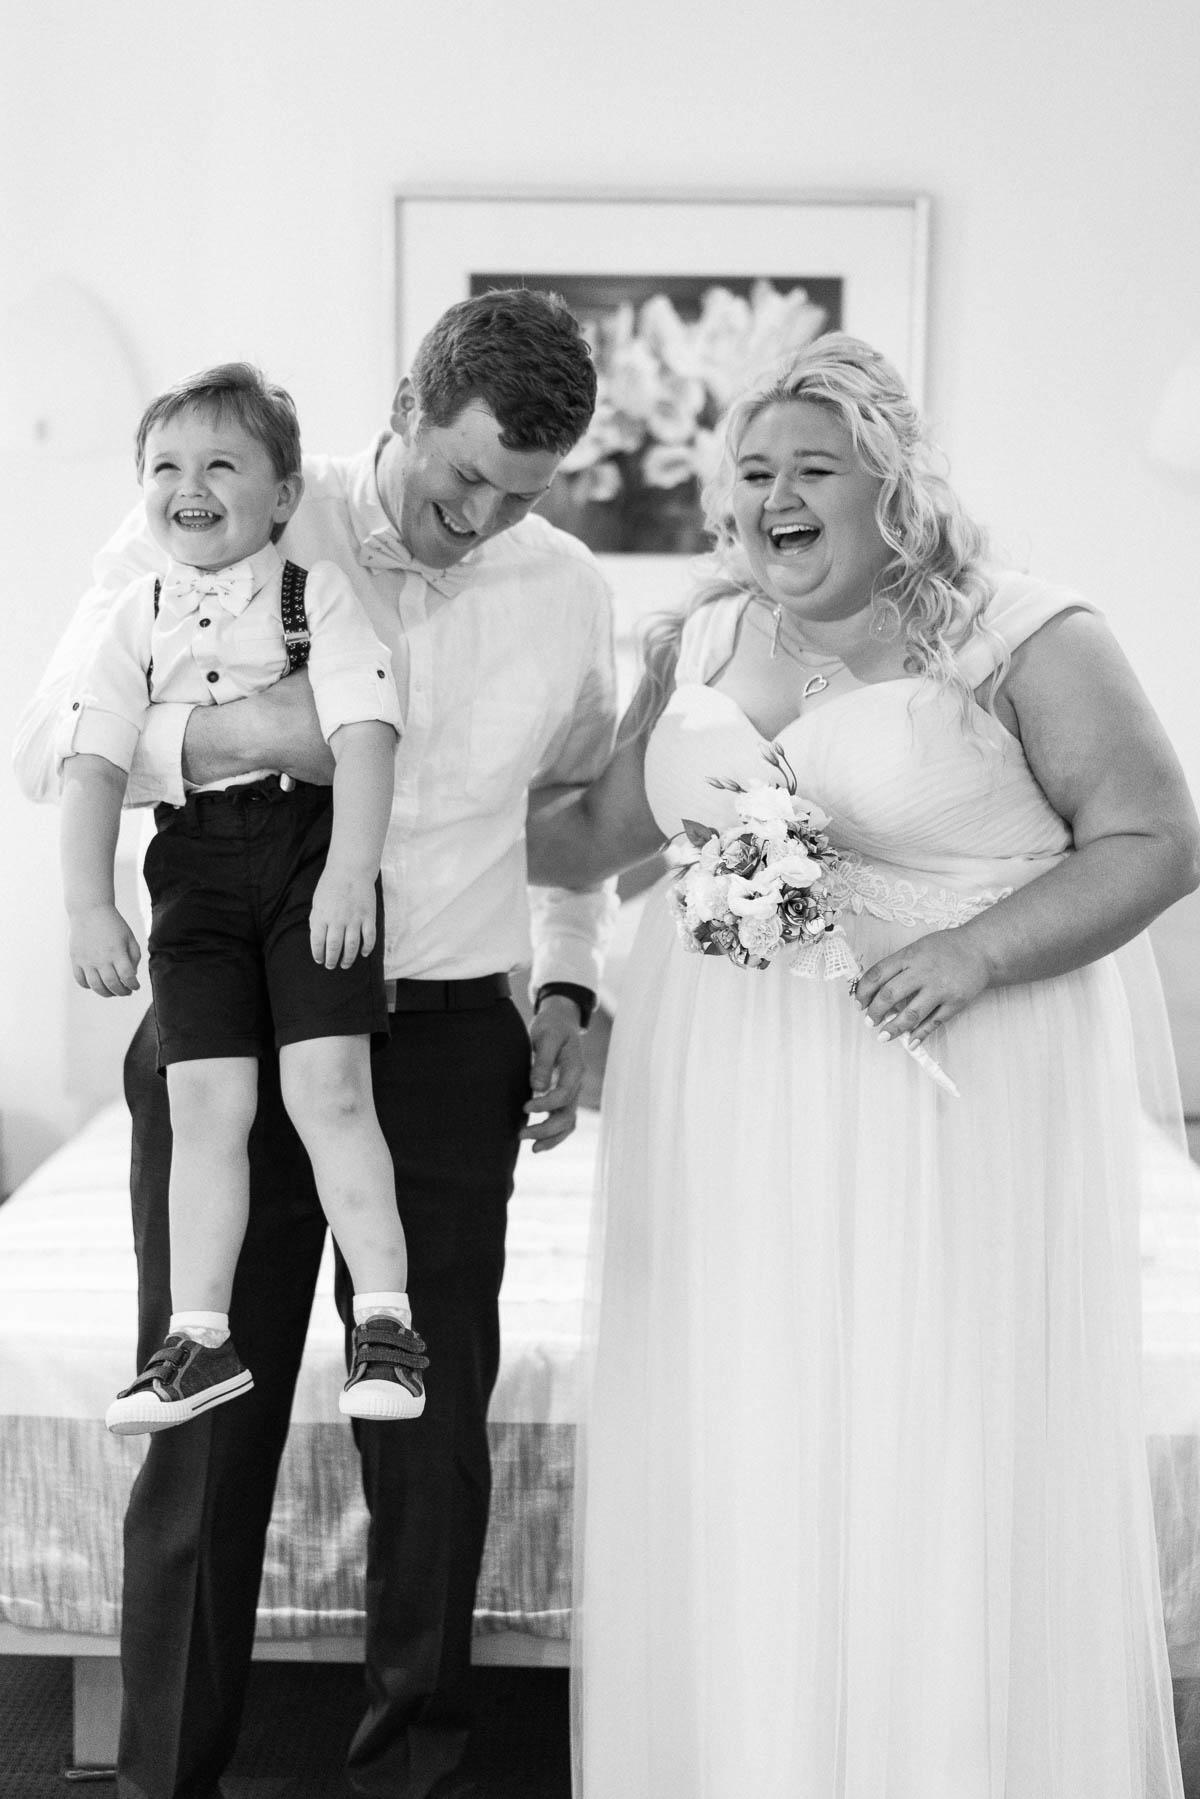 mt-eliza-mornington-peninsula-backyard-wedding-heart+soul-weddings-allison-matt-03089.jpg